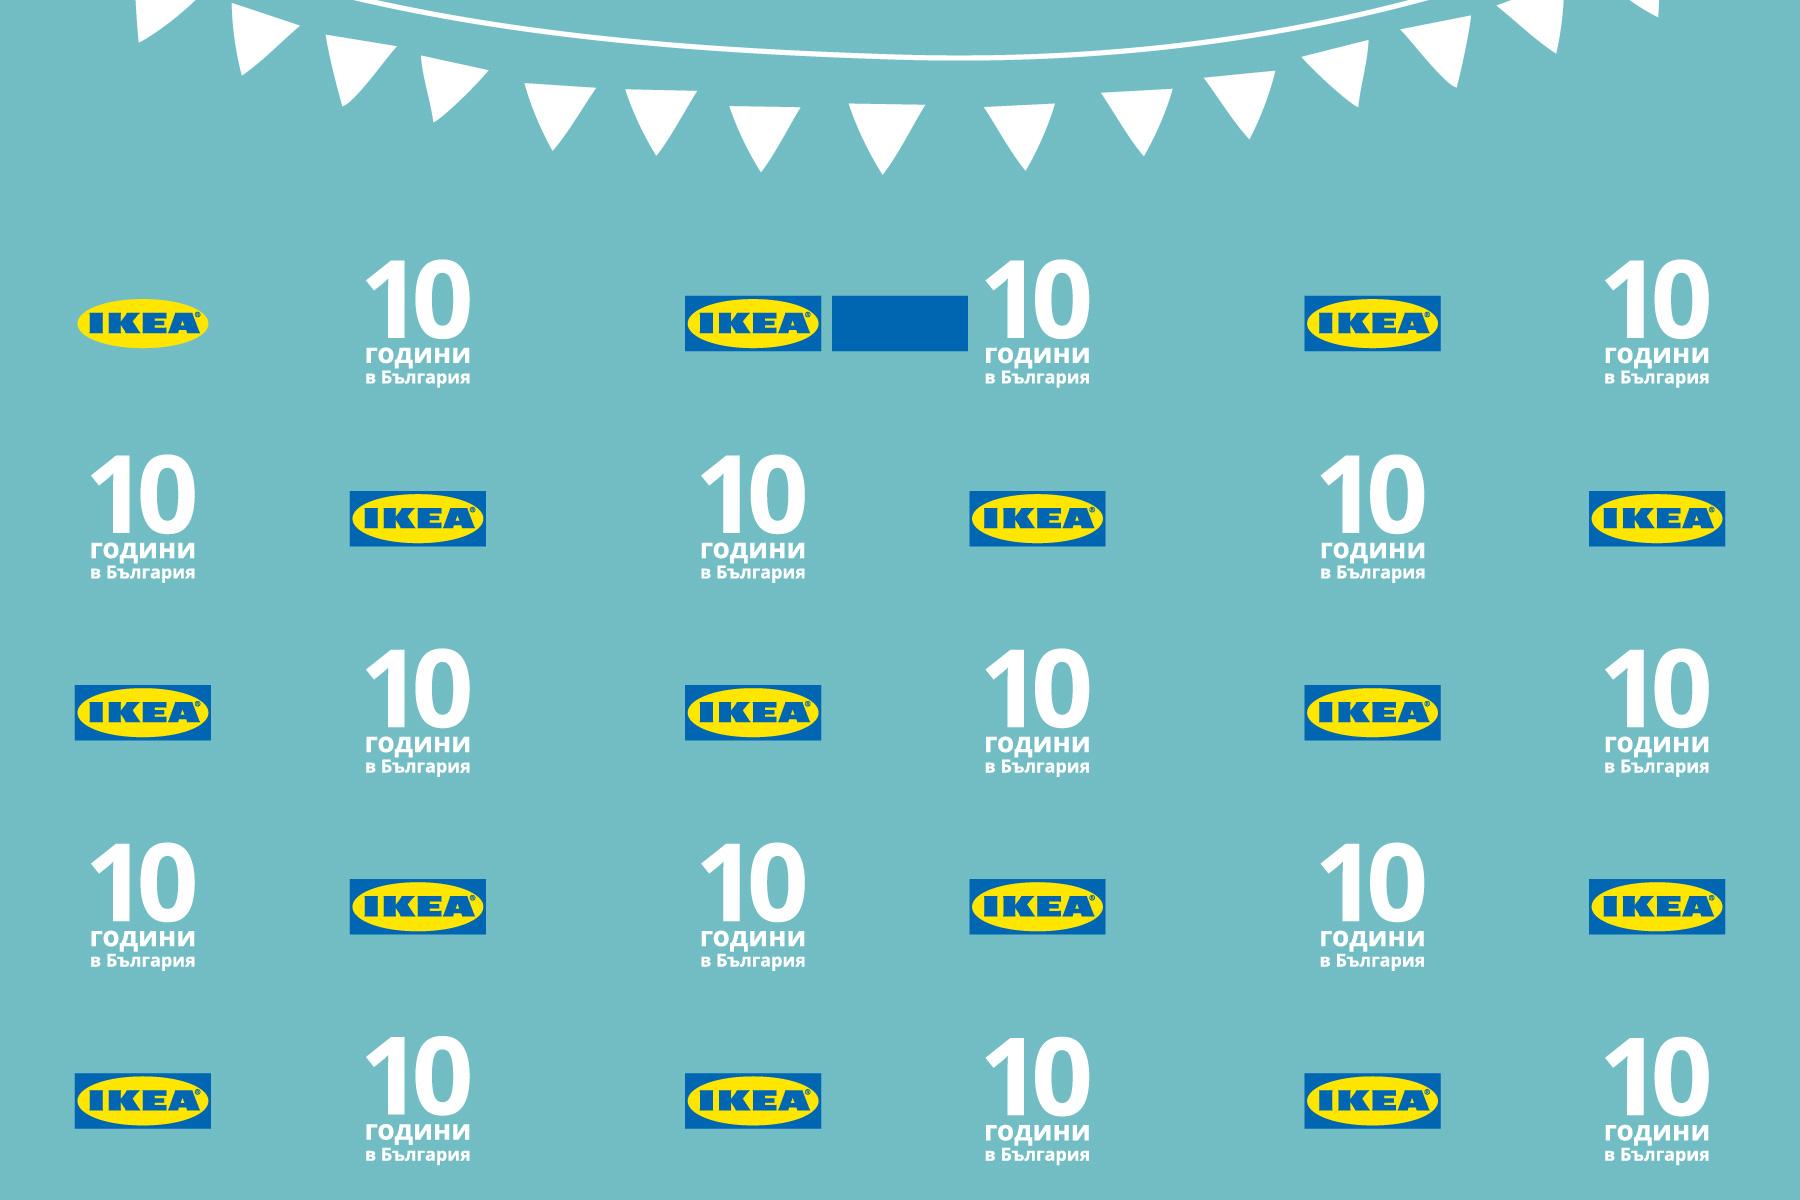 IKEA - Photo Booth